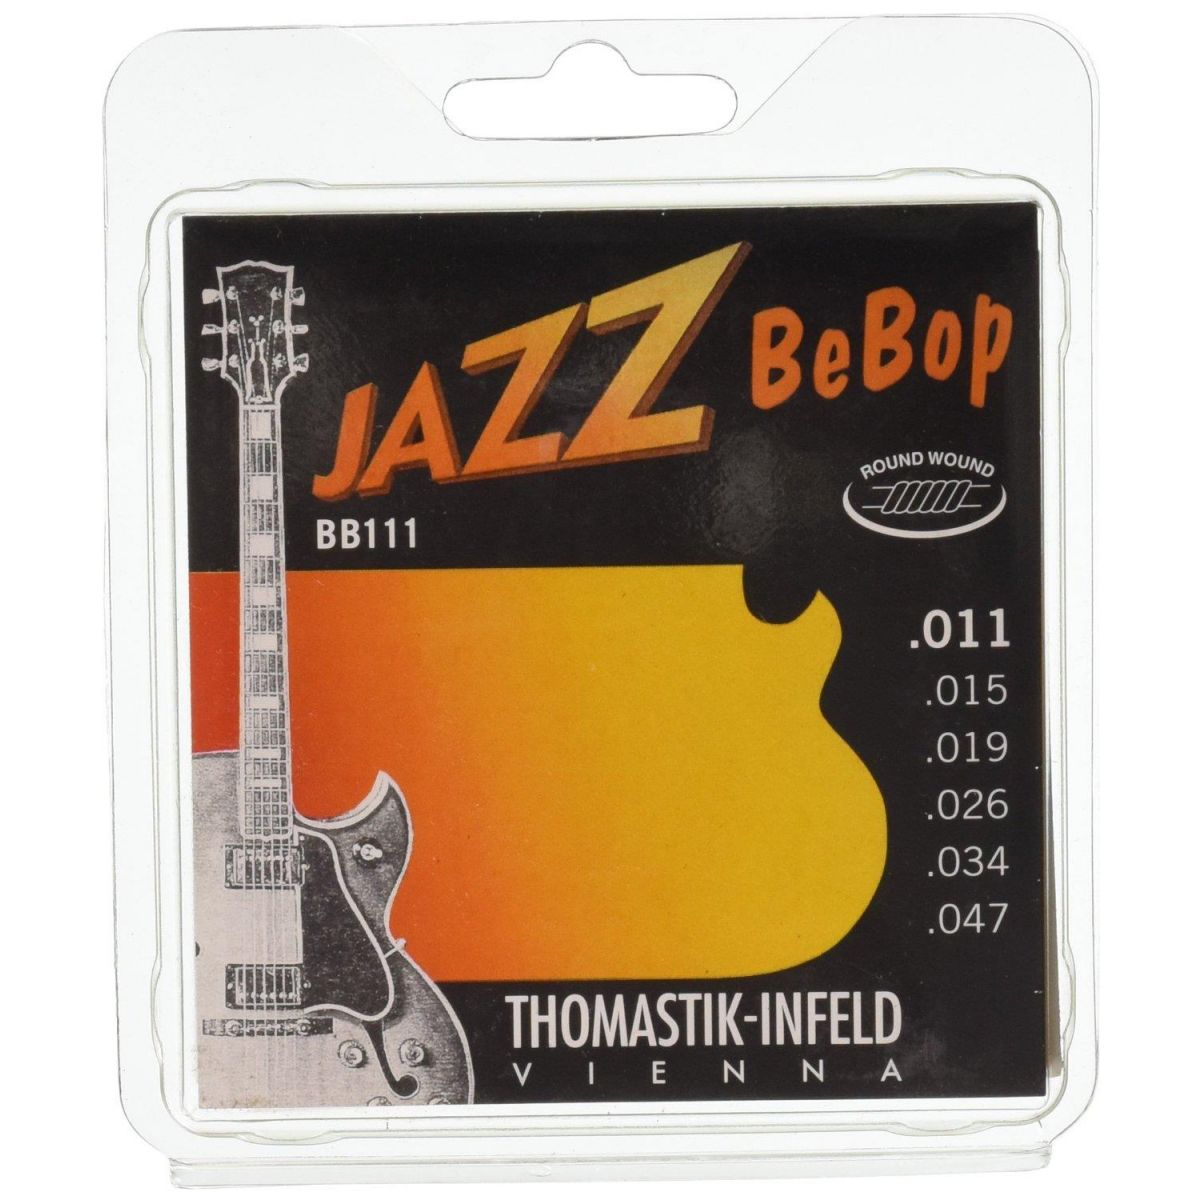 Corde Thomastik Jazz Bepop BB111